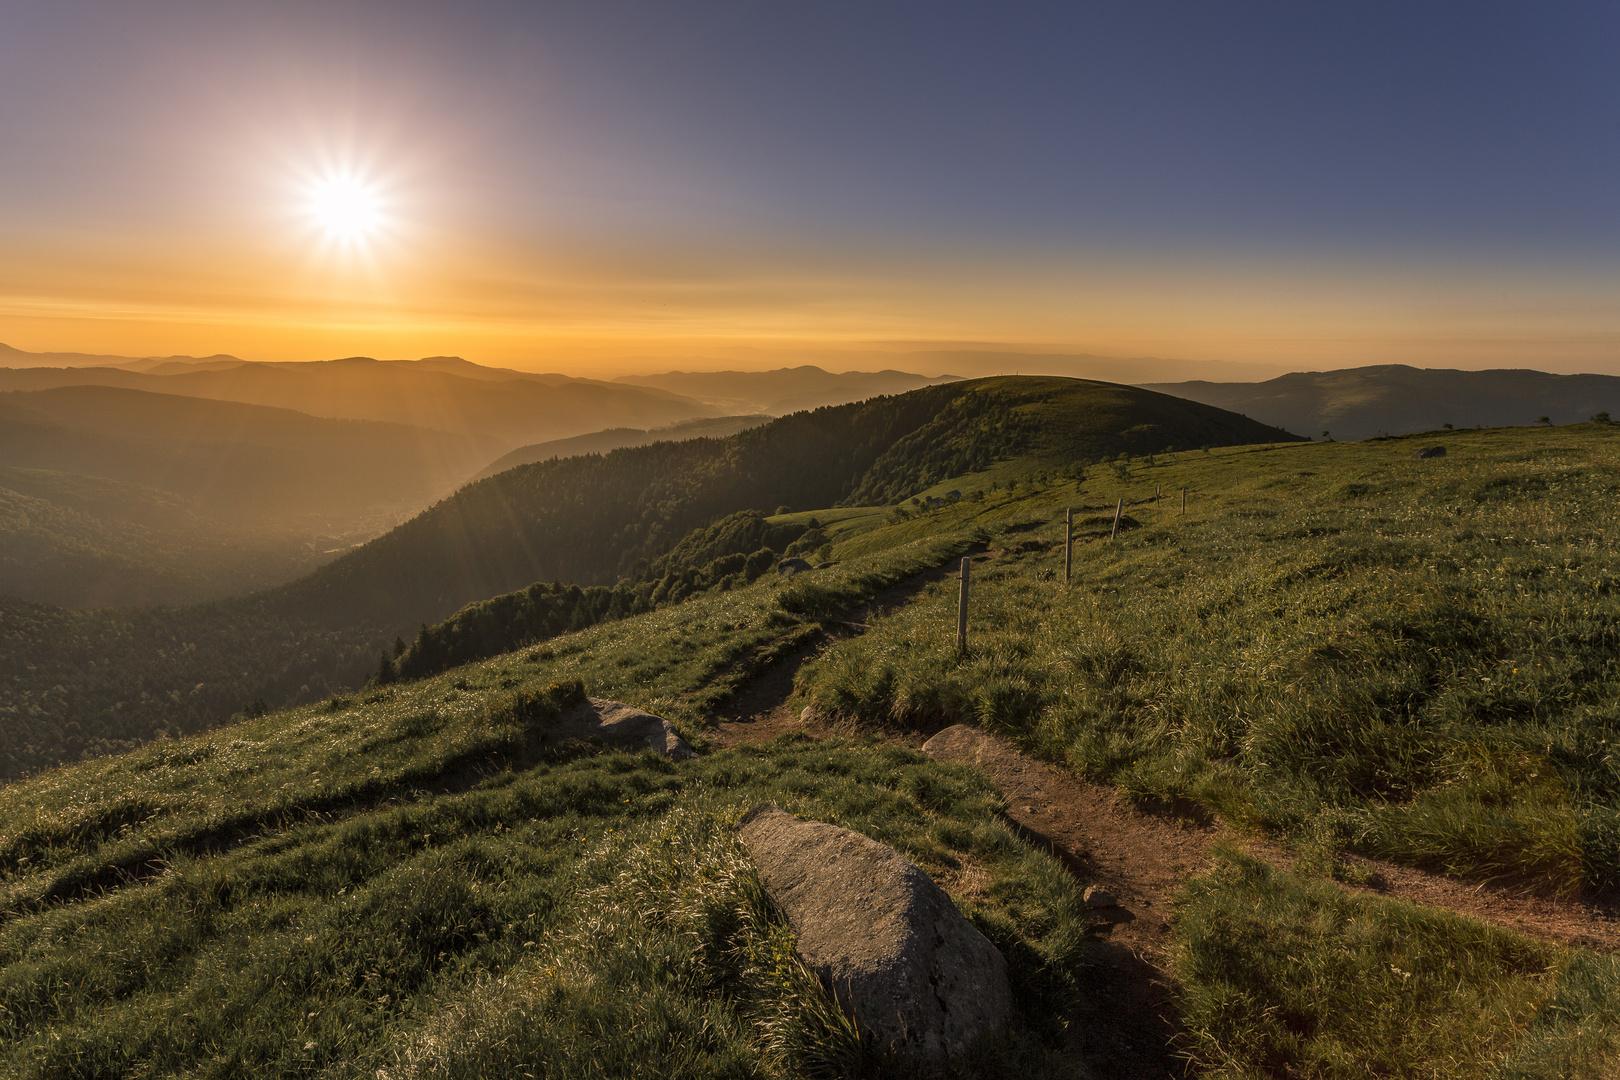 Sonnenaufgang in den Vogesen